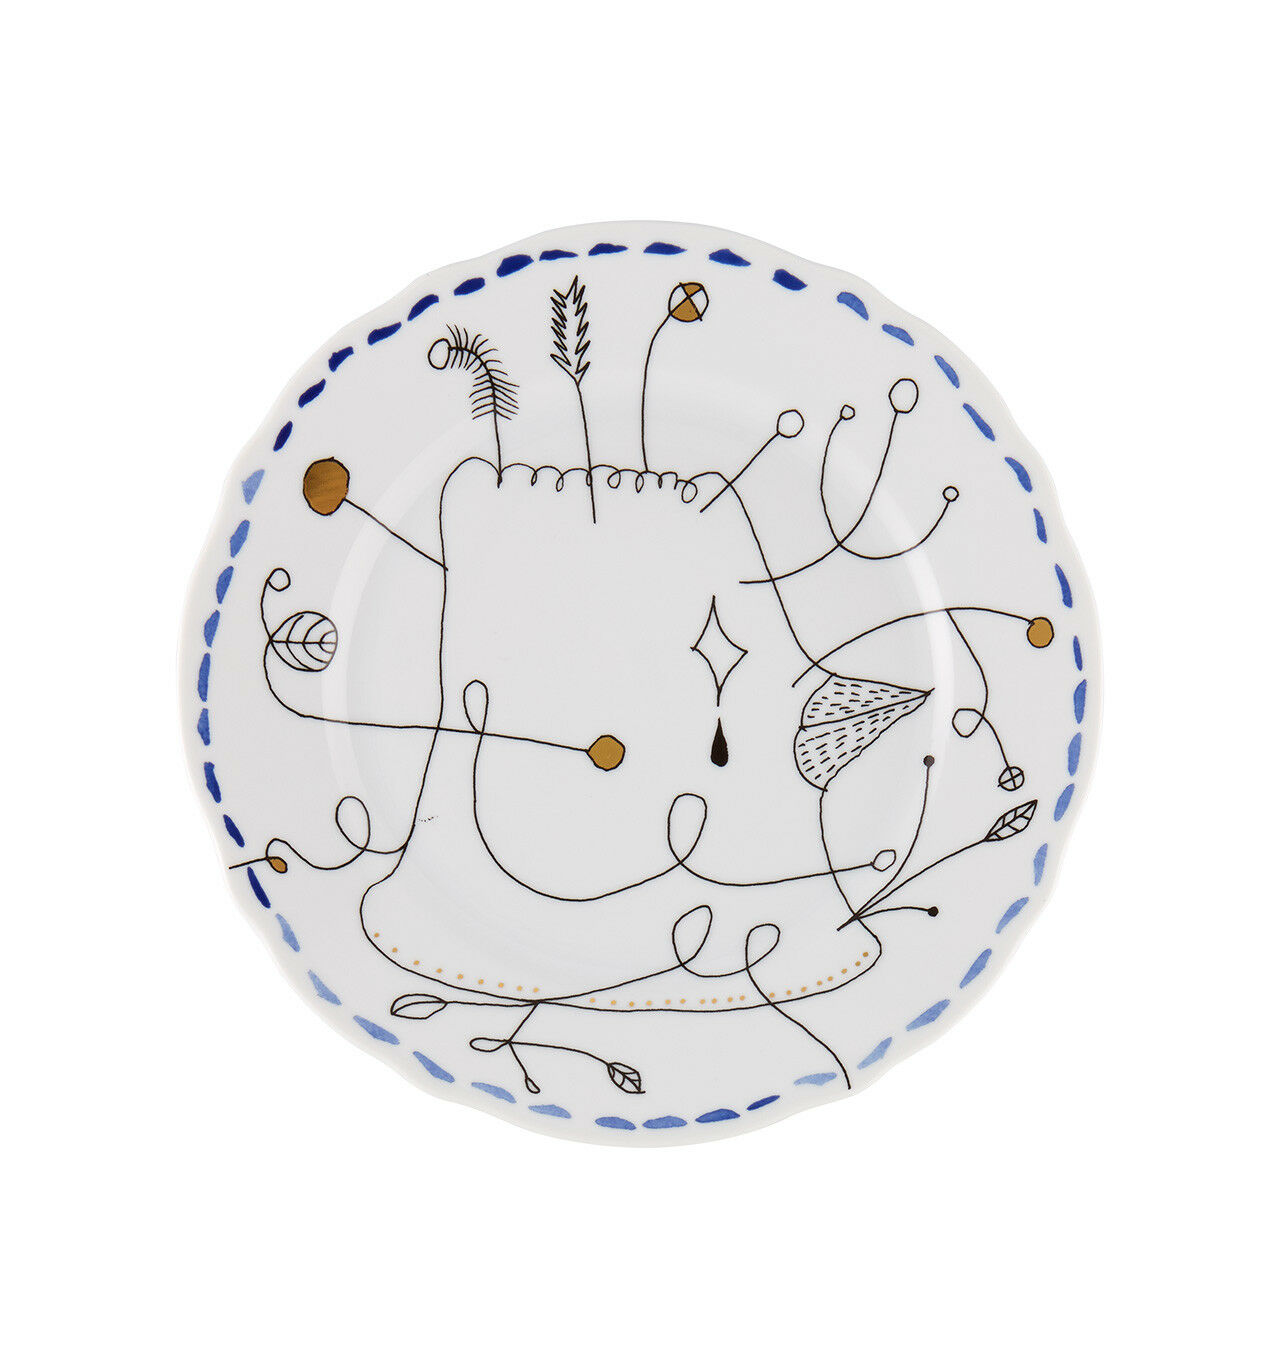 Vista Alegre Folkifunki Dessert Plate bleu - Set of 8